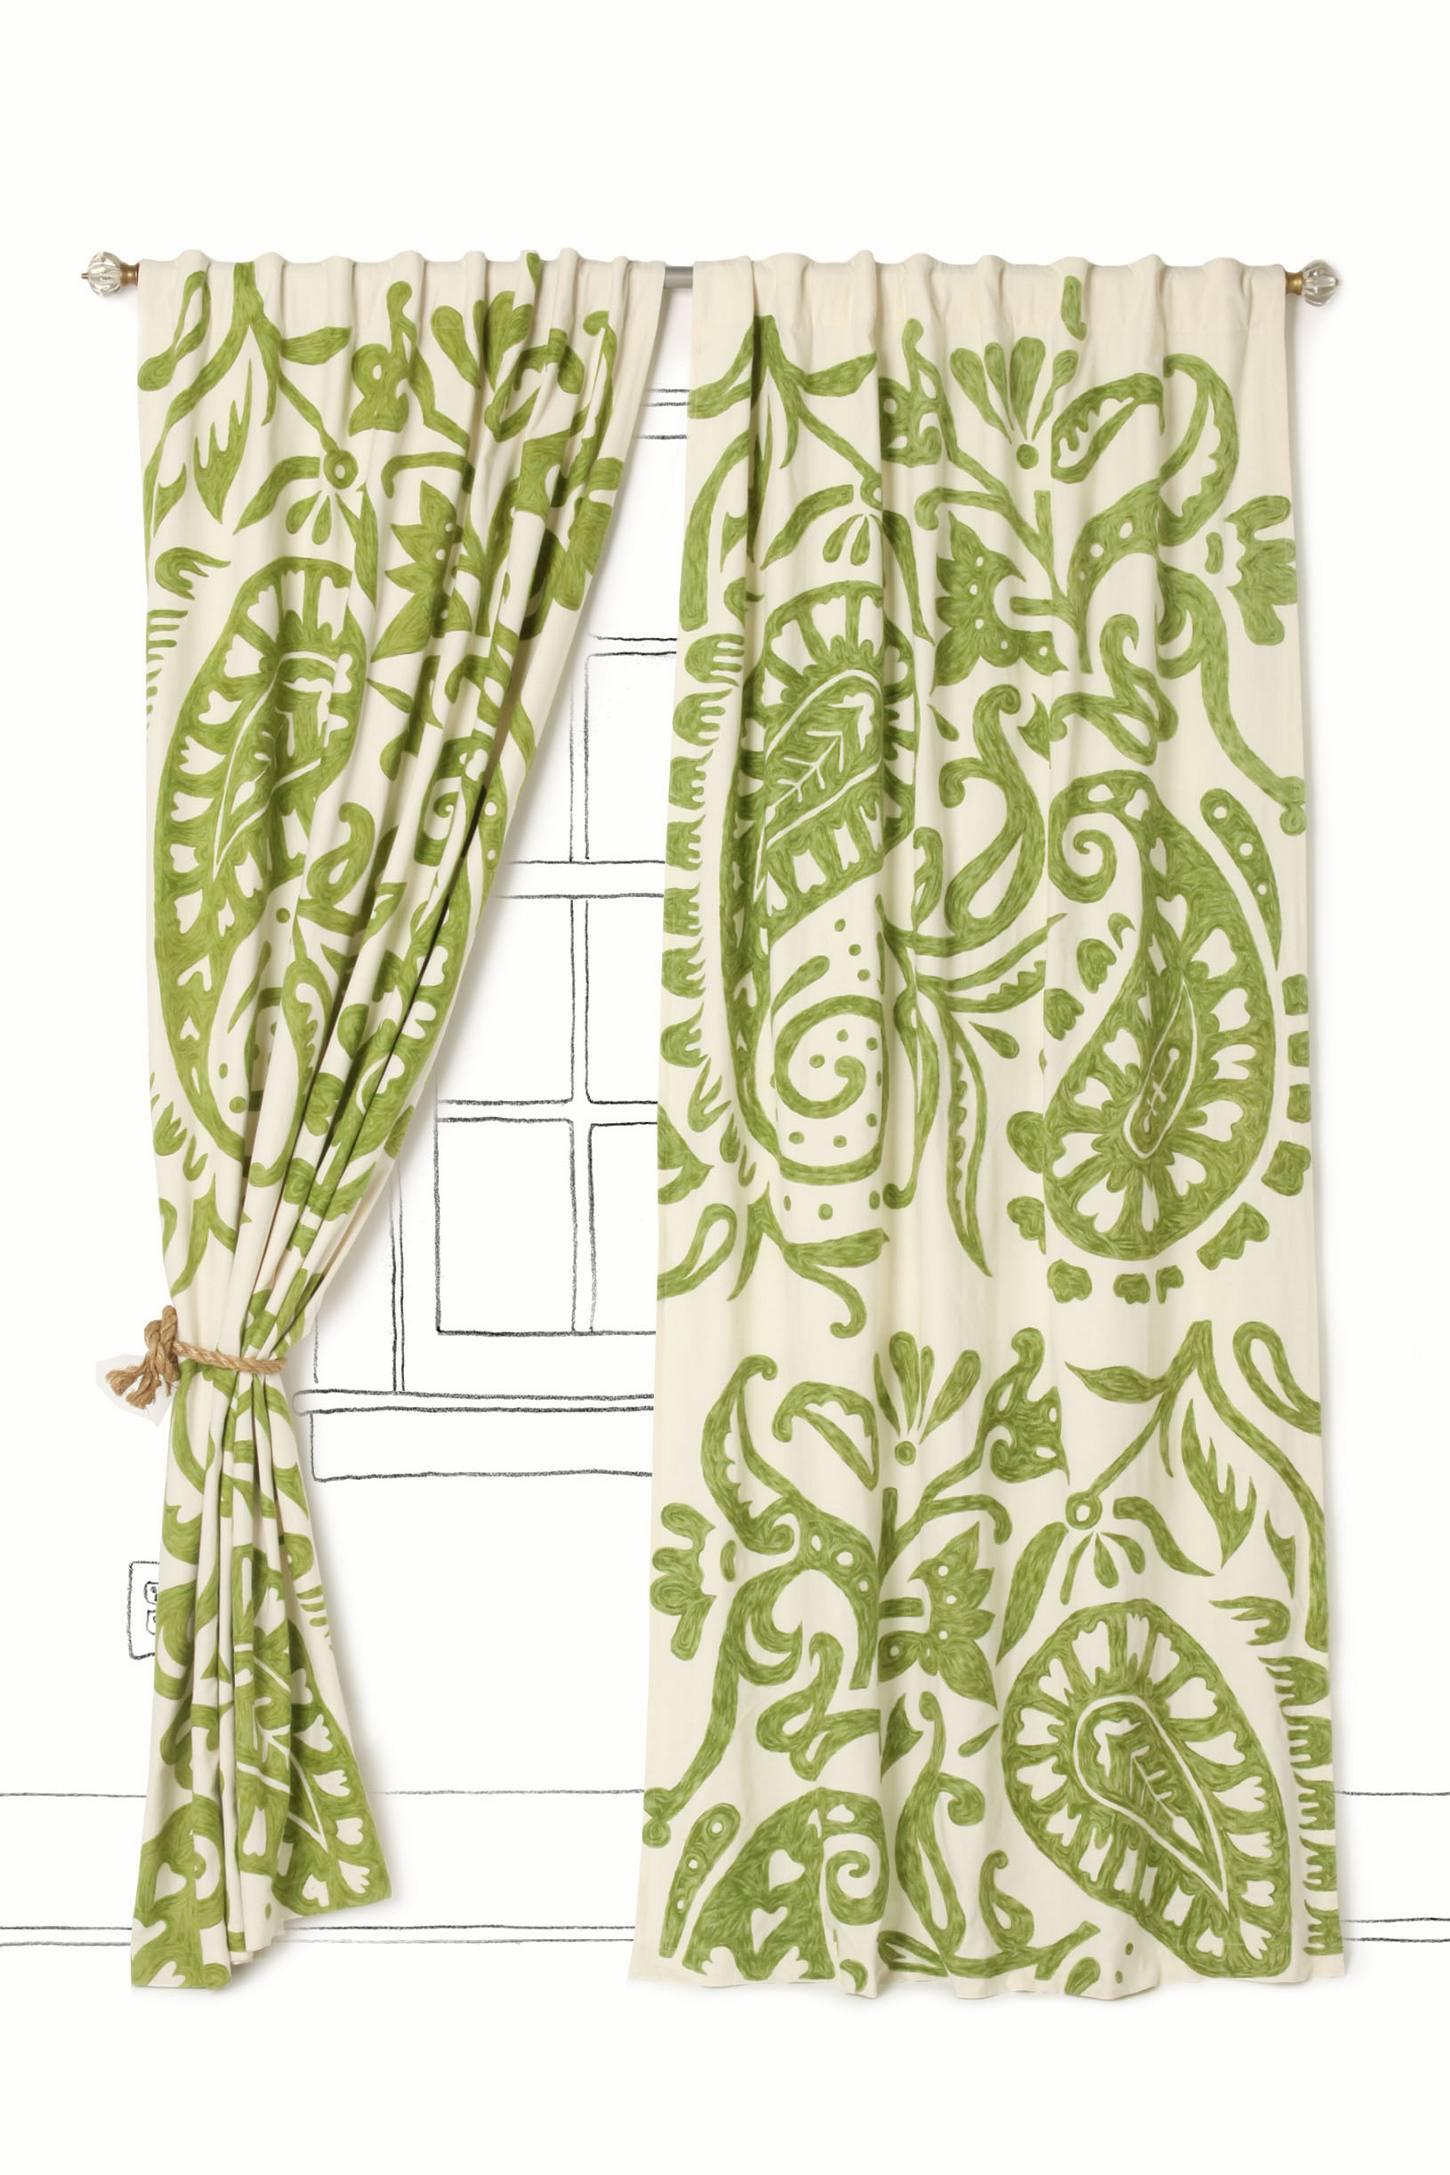 lucianna free sliding medallion shower drape drapes peyton dining curtains image door pottery glass room barn